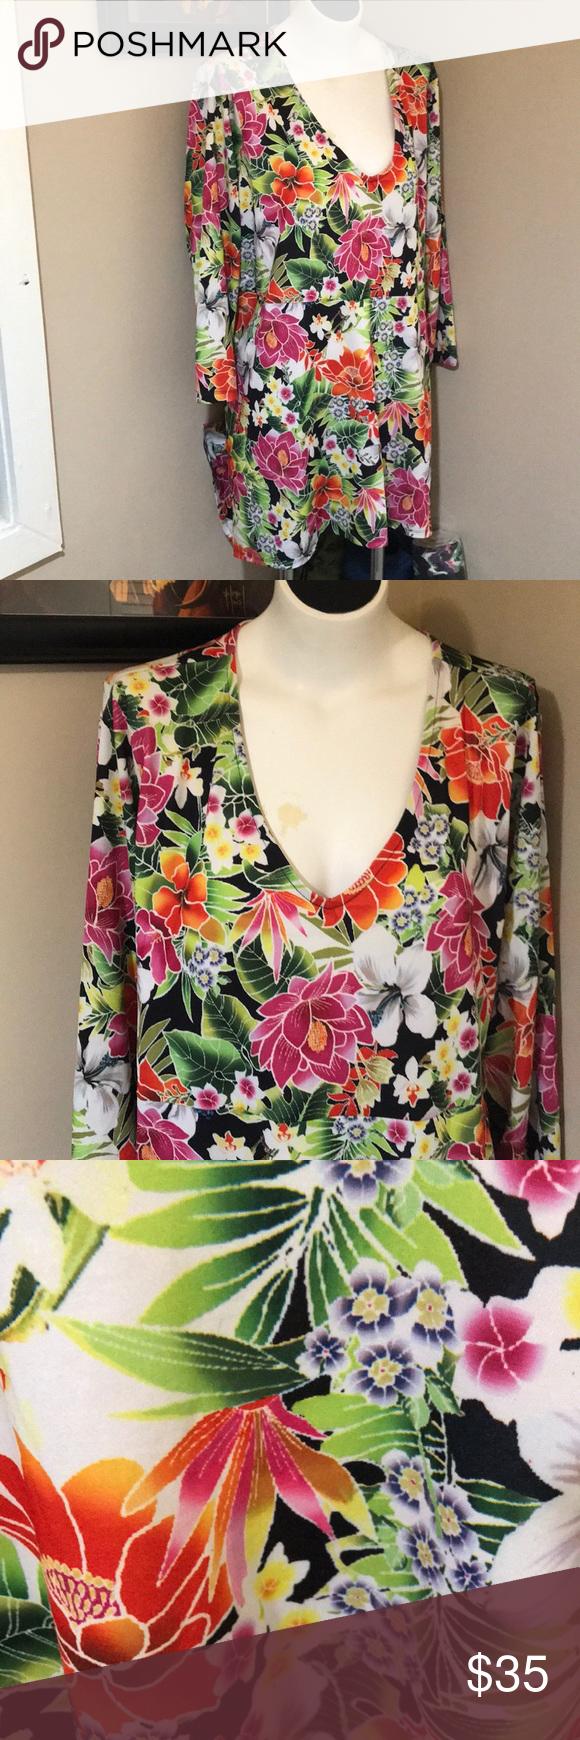 Slinky 2x Floral Summer Dress Floral Dress Summer Summer Dresses Clothes Design [ 1740 x 580 Pixel ]